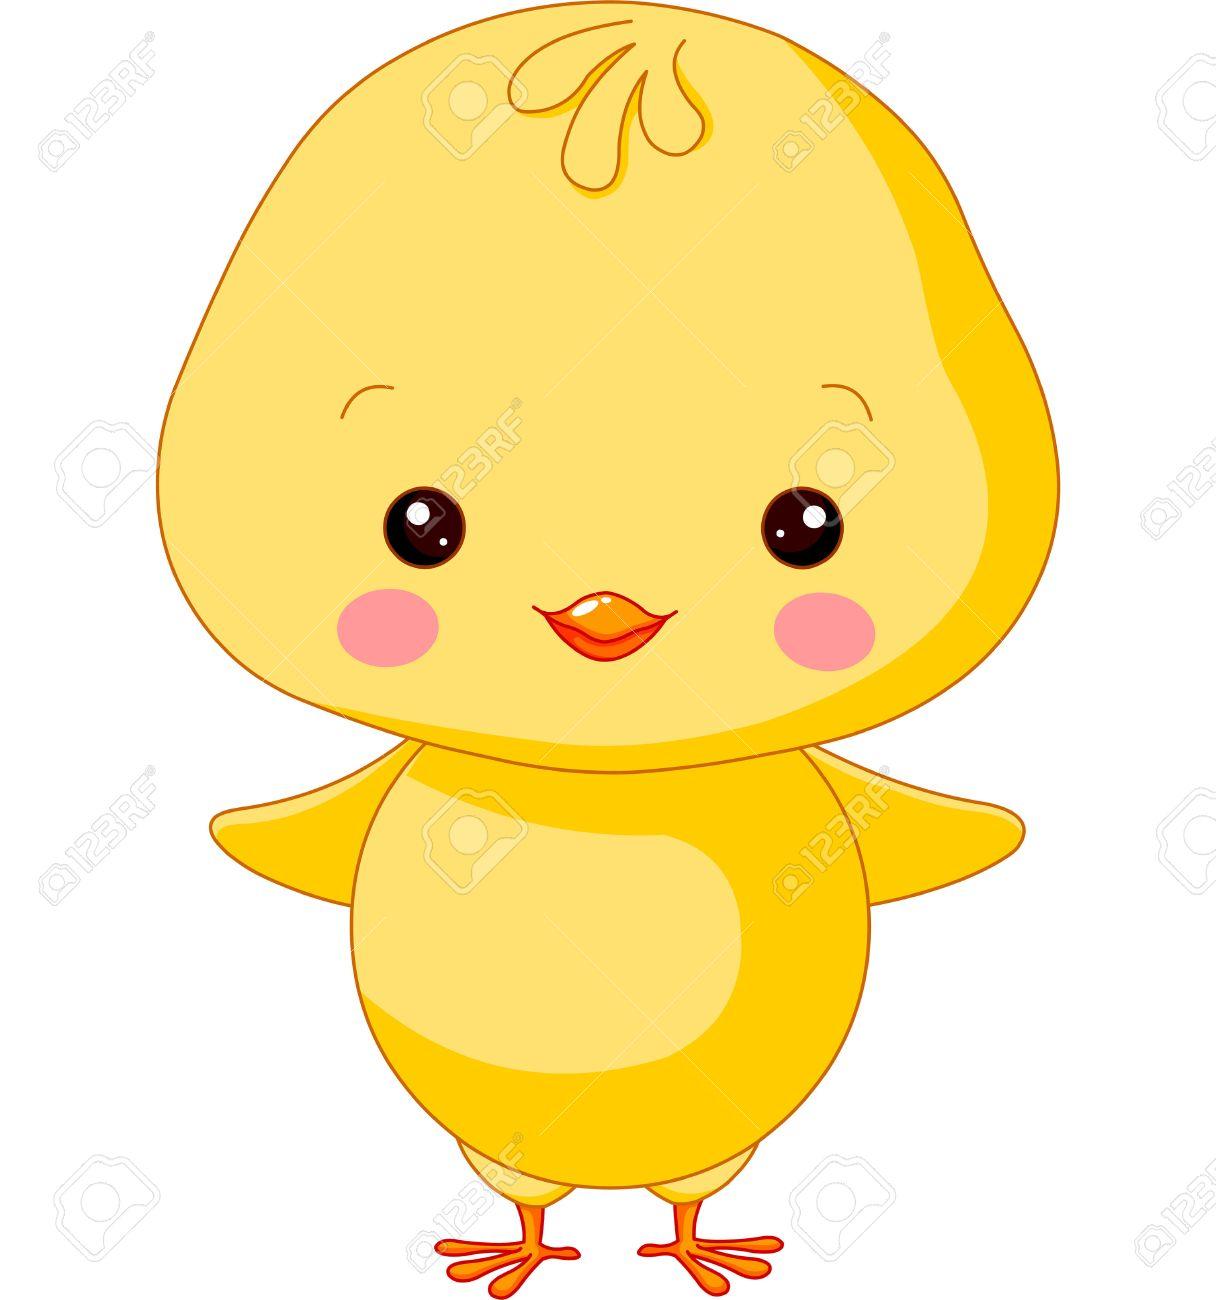 Baby Farm Animals Clip Art farm animals. illustration of cute chick royalty free cliparts